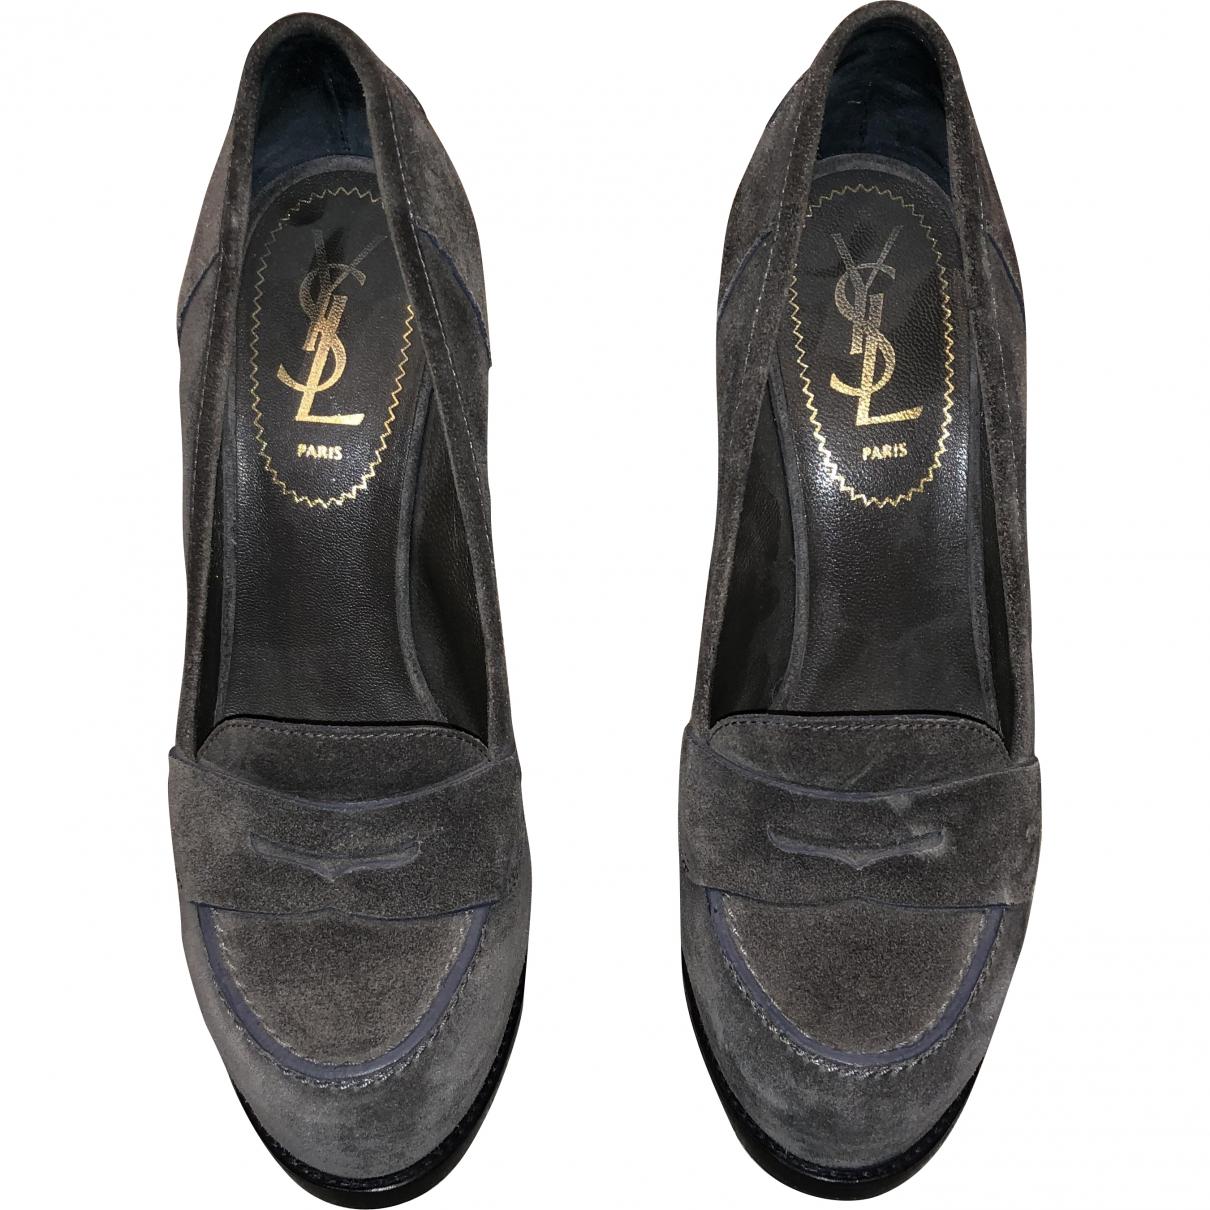 Yves Saint Laurent \N Grey Suede Heels for Women 36 EU